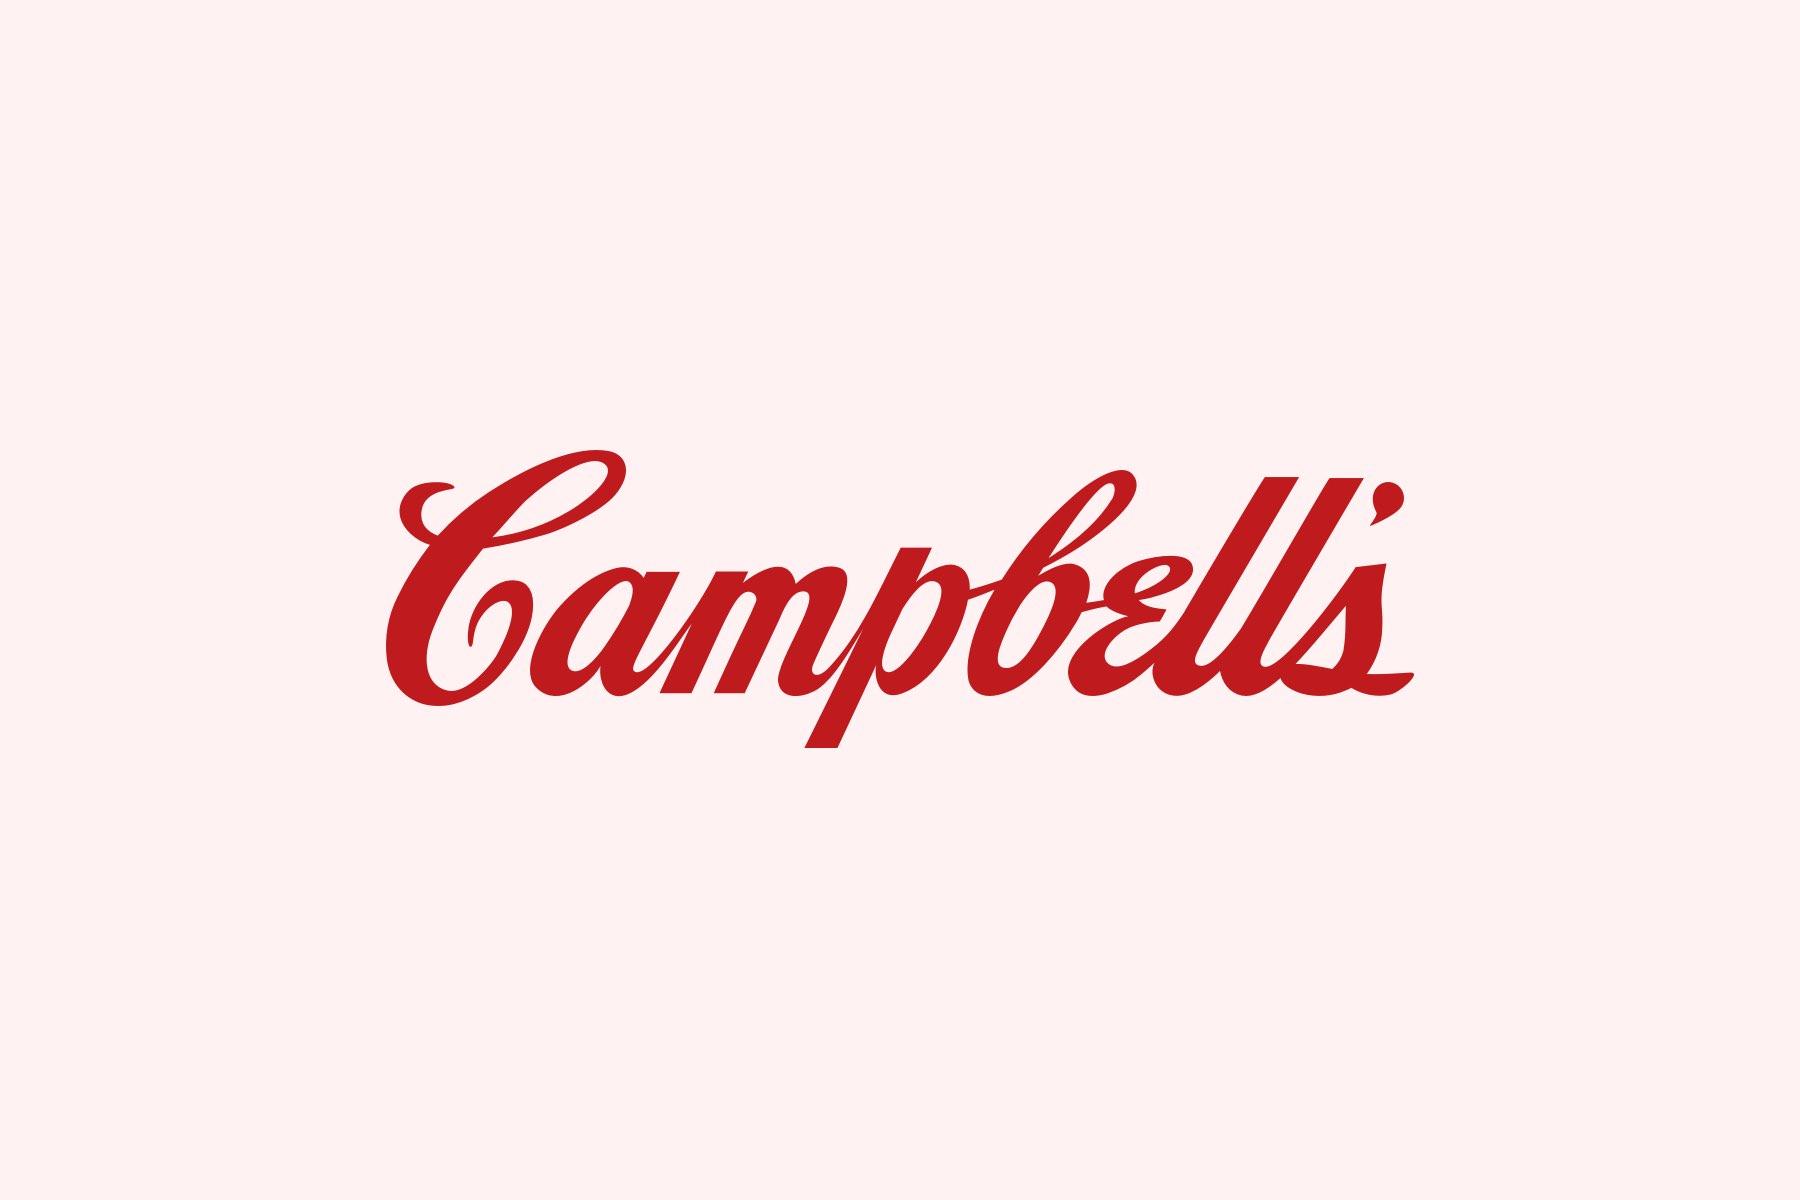 Photo of Campbells headquarters.